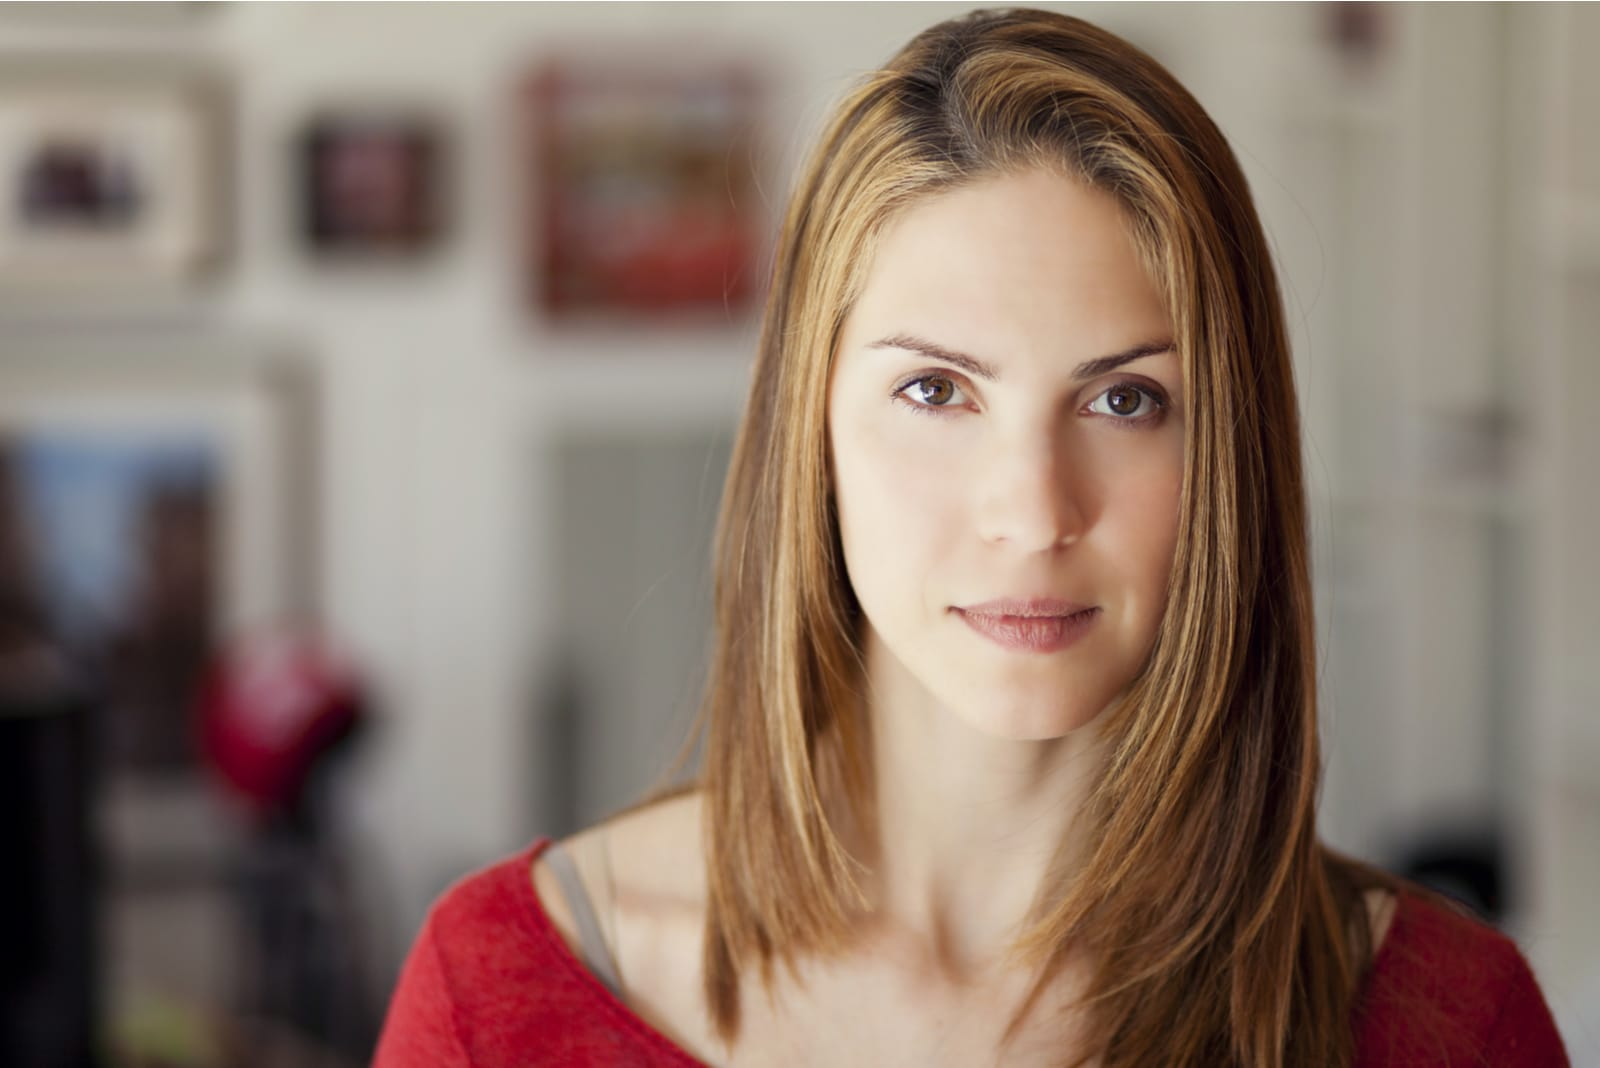 portrait of an attractive serious brunette